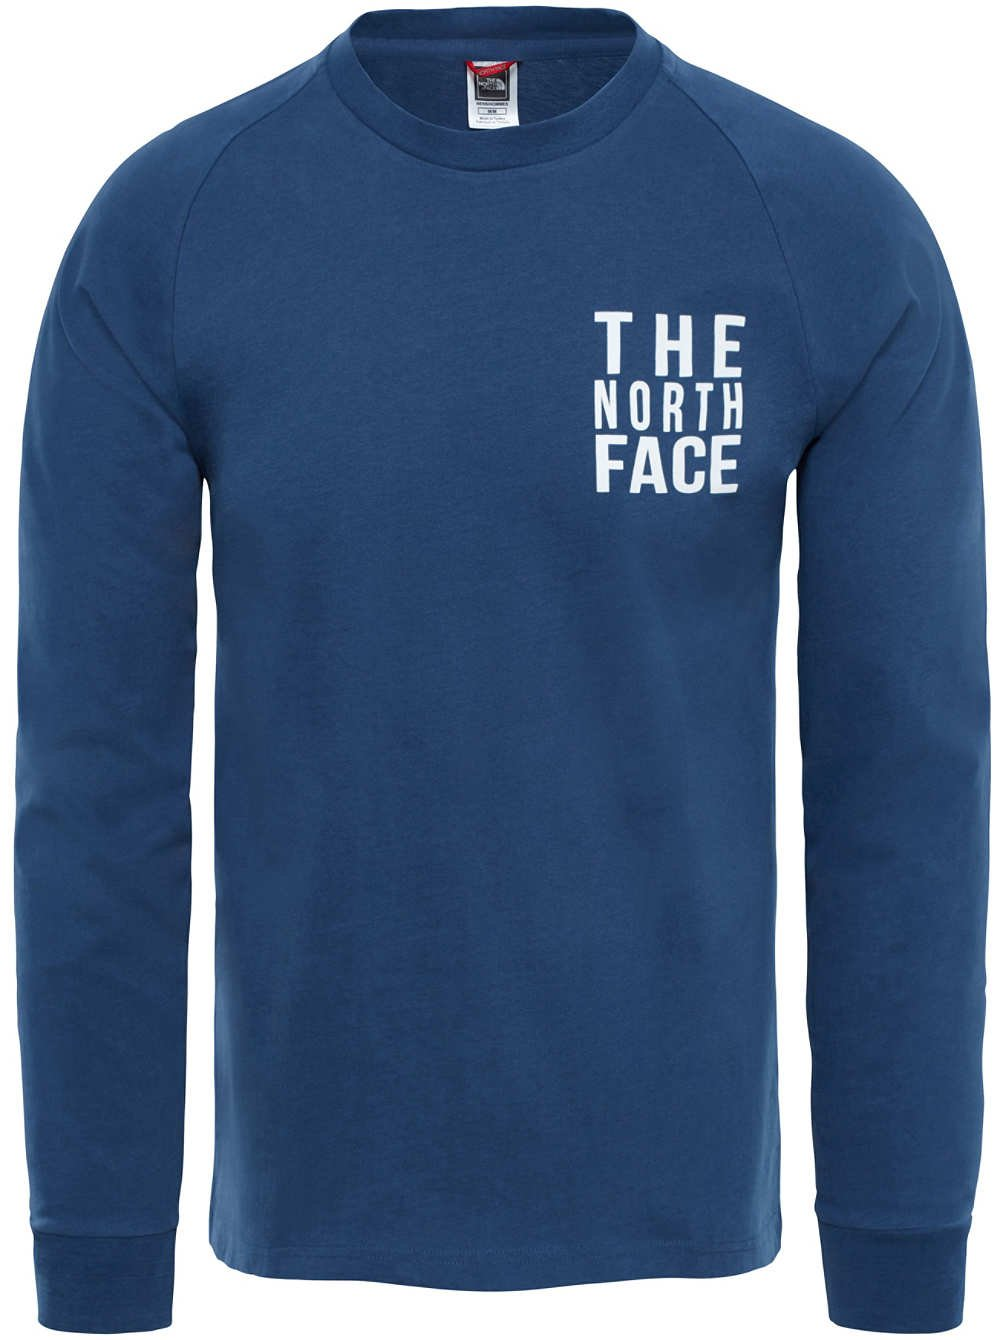 THE NORTH FACE M L/S Ones T Shirt, Herren